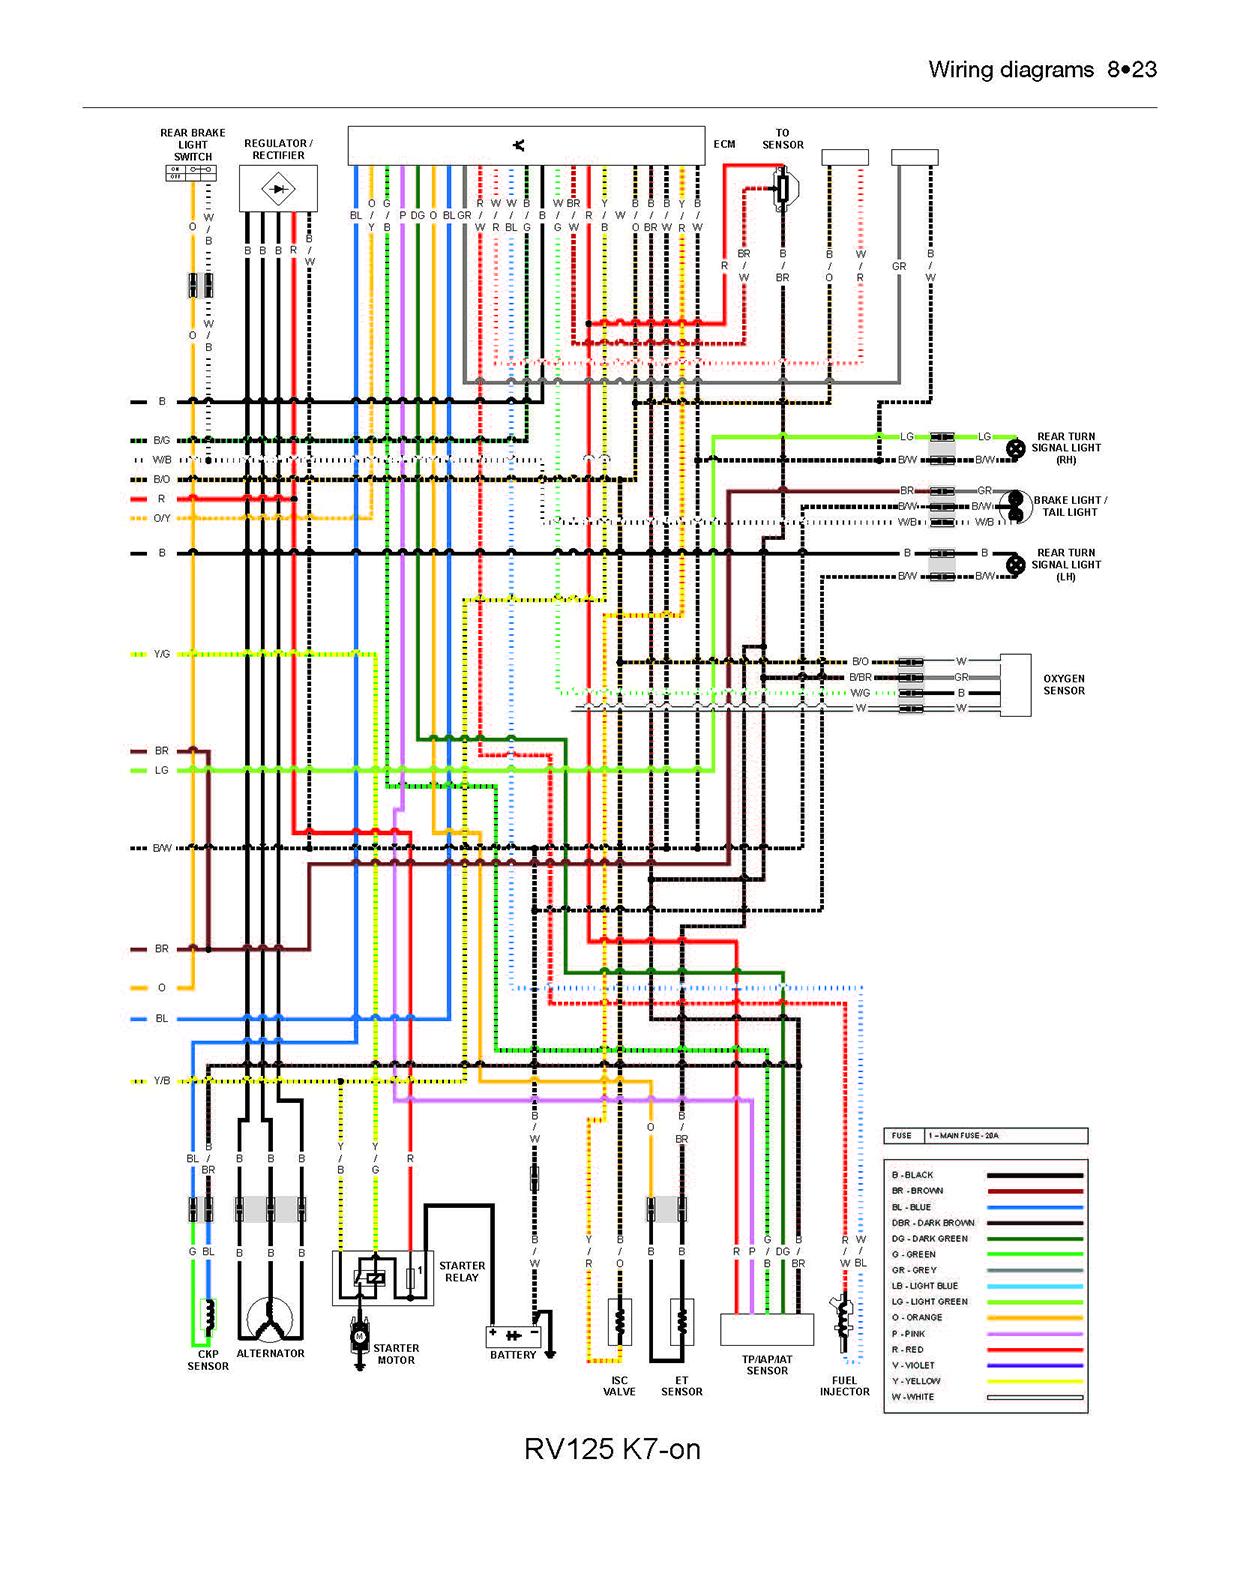 suzuki rv 125 wiring diagram suzuki rv125/200 vanvan (03 - 17) haynes repair manual ... #7